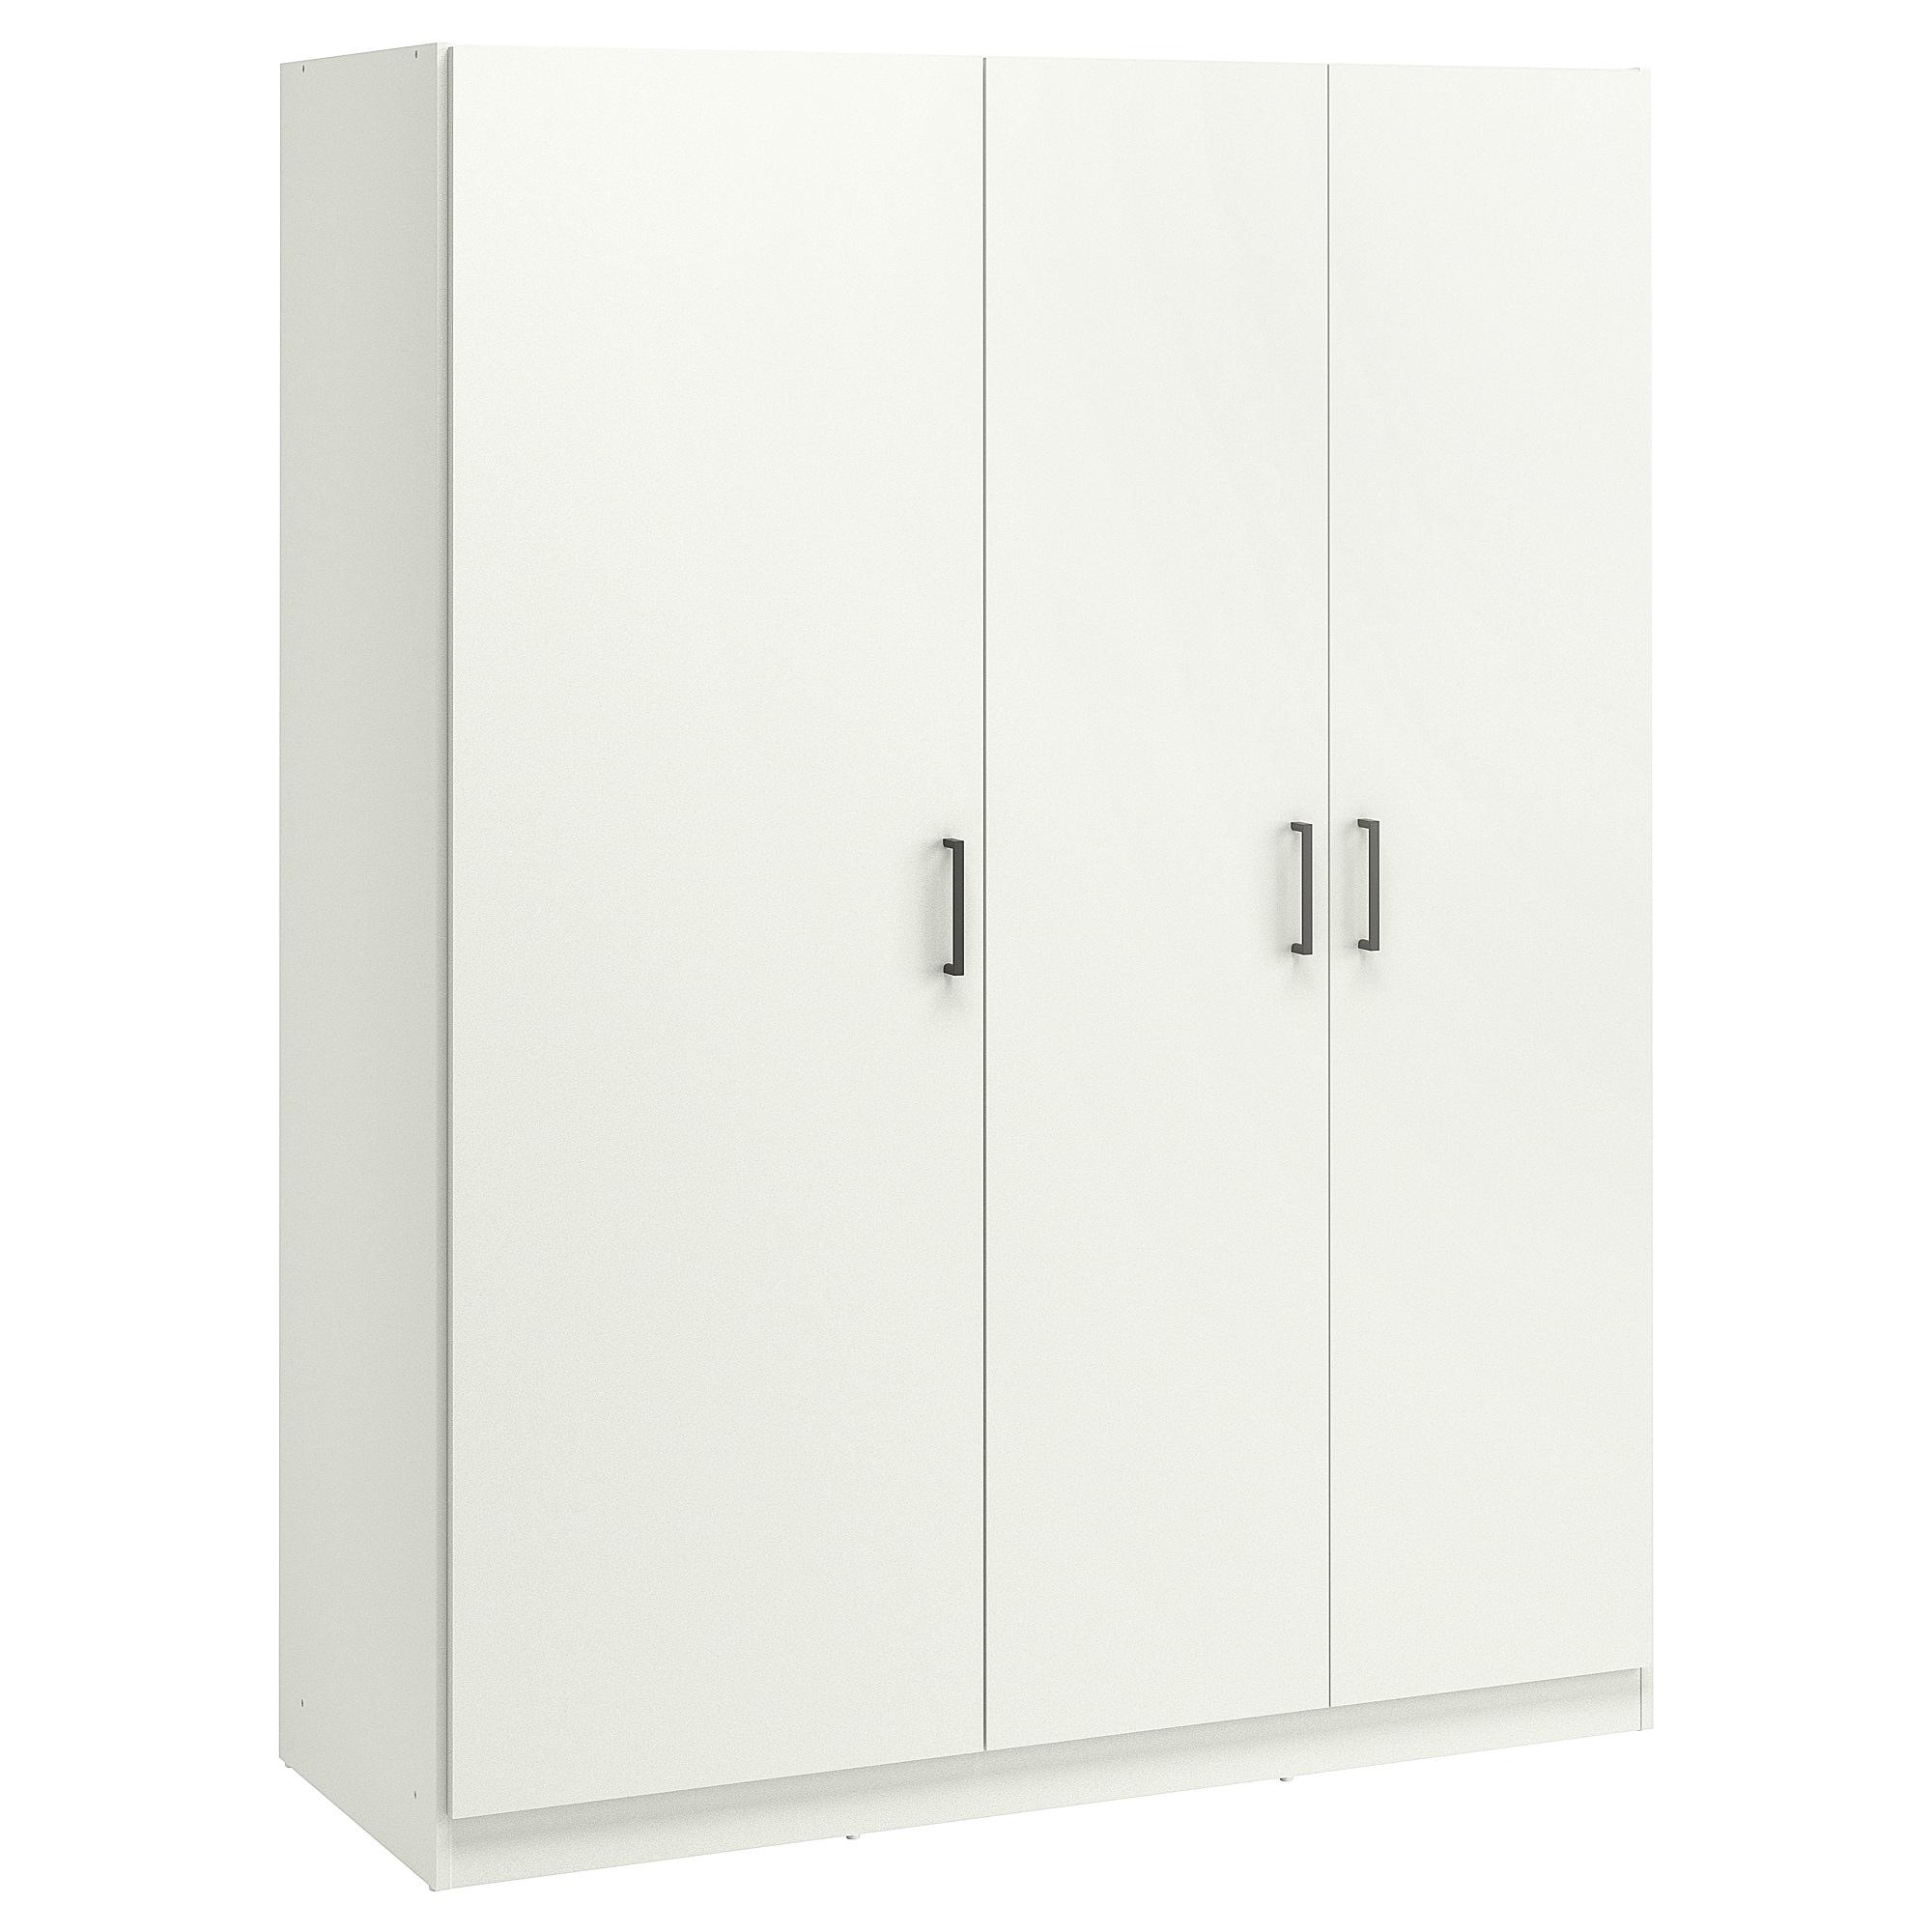 Ikea Armarios A Medida Nkde Dombà S Armario Blanco 140 X 181 Cm Ikea